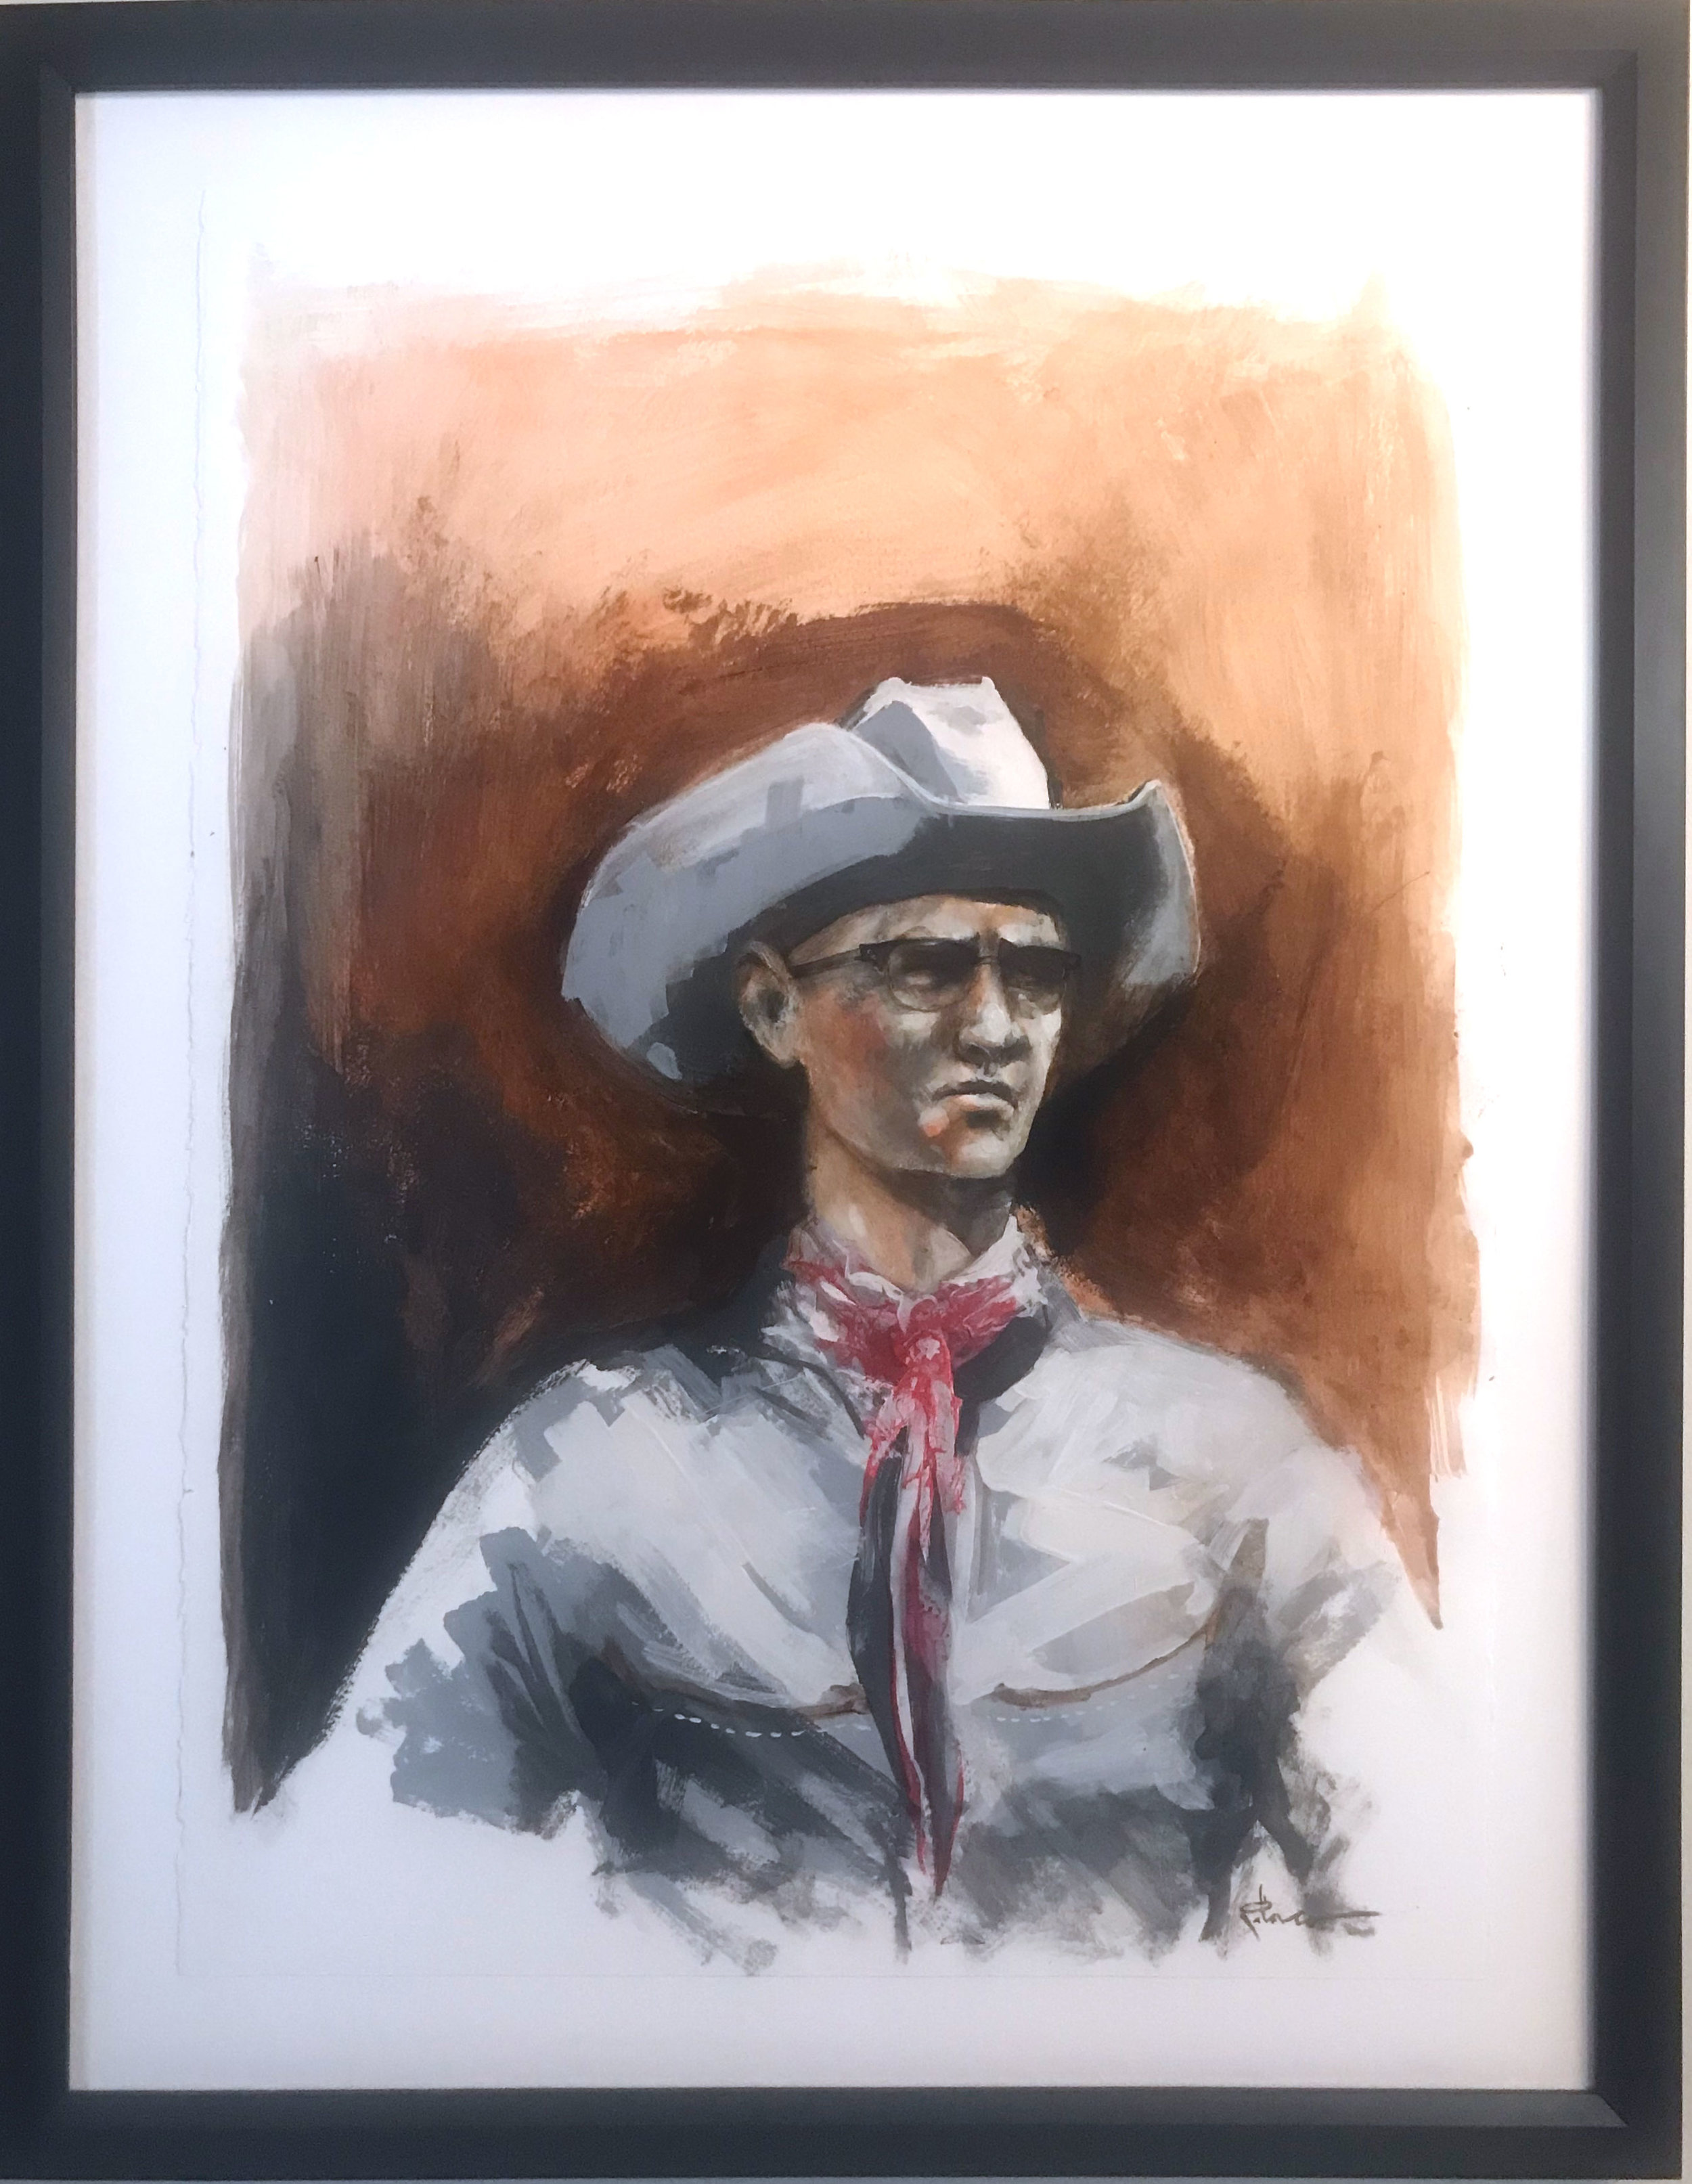 Ranch Hand - $895